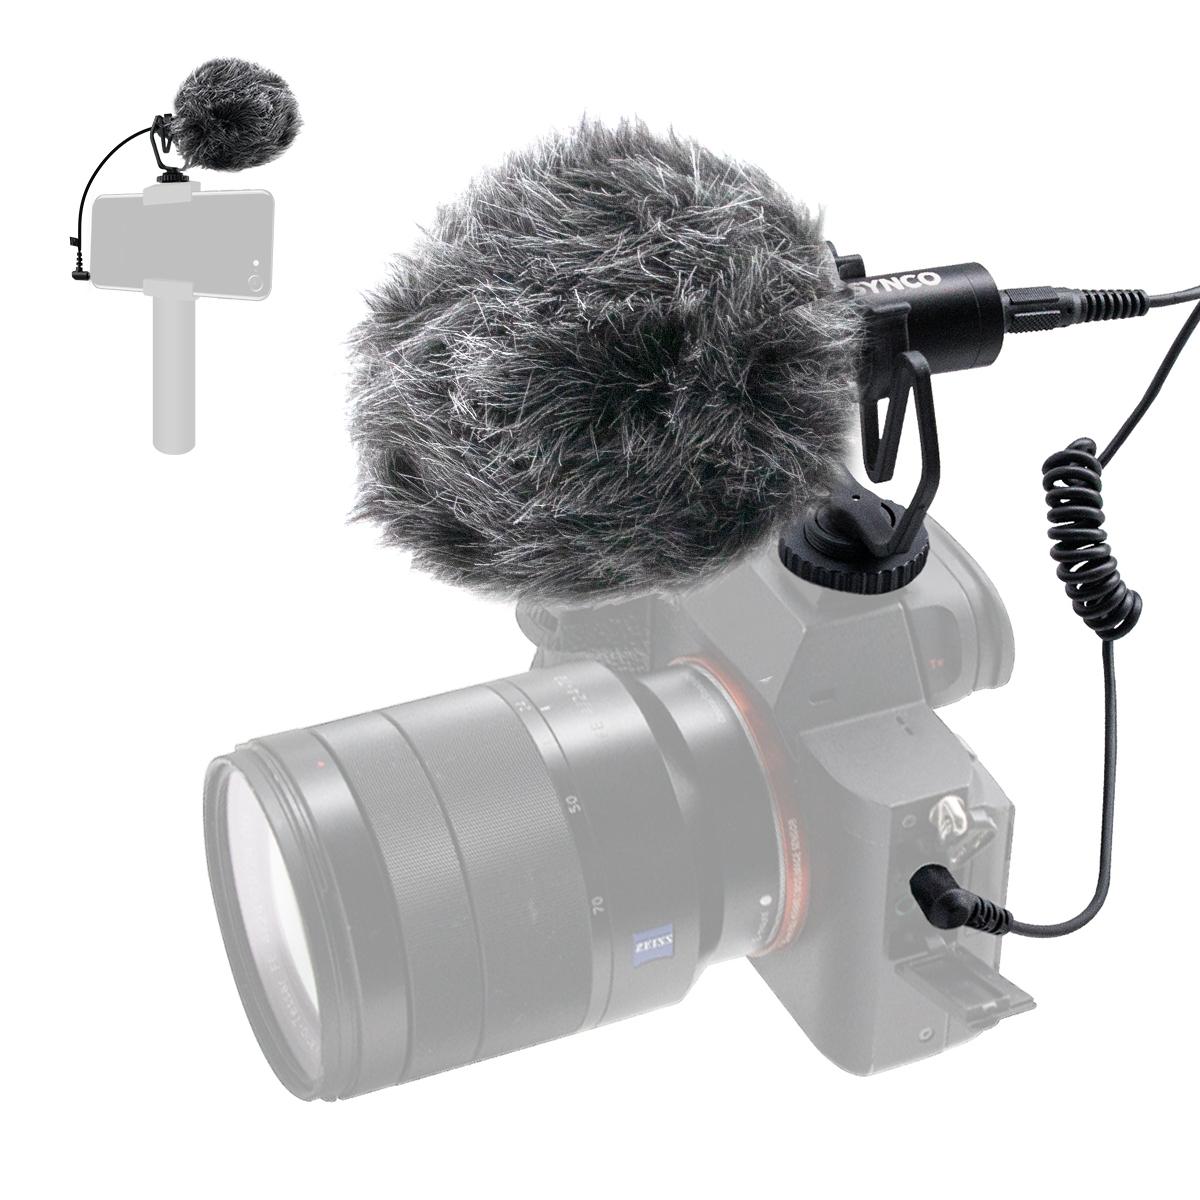 фото накамерного микрофона Synco Mic-M1 для телефона, камеры